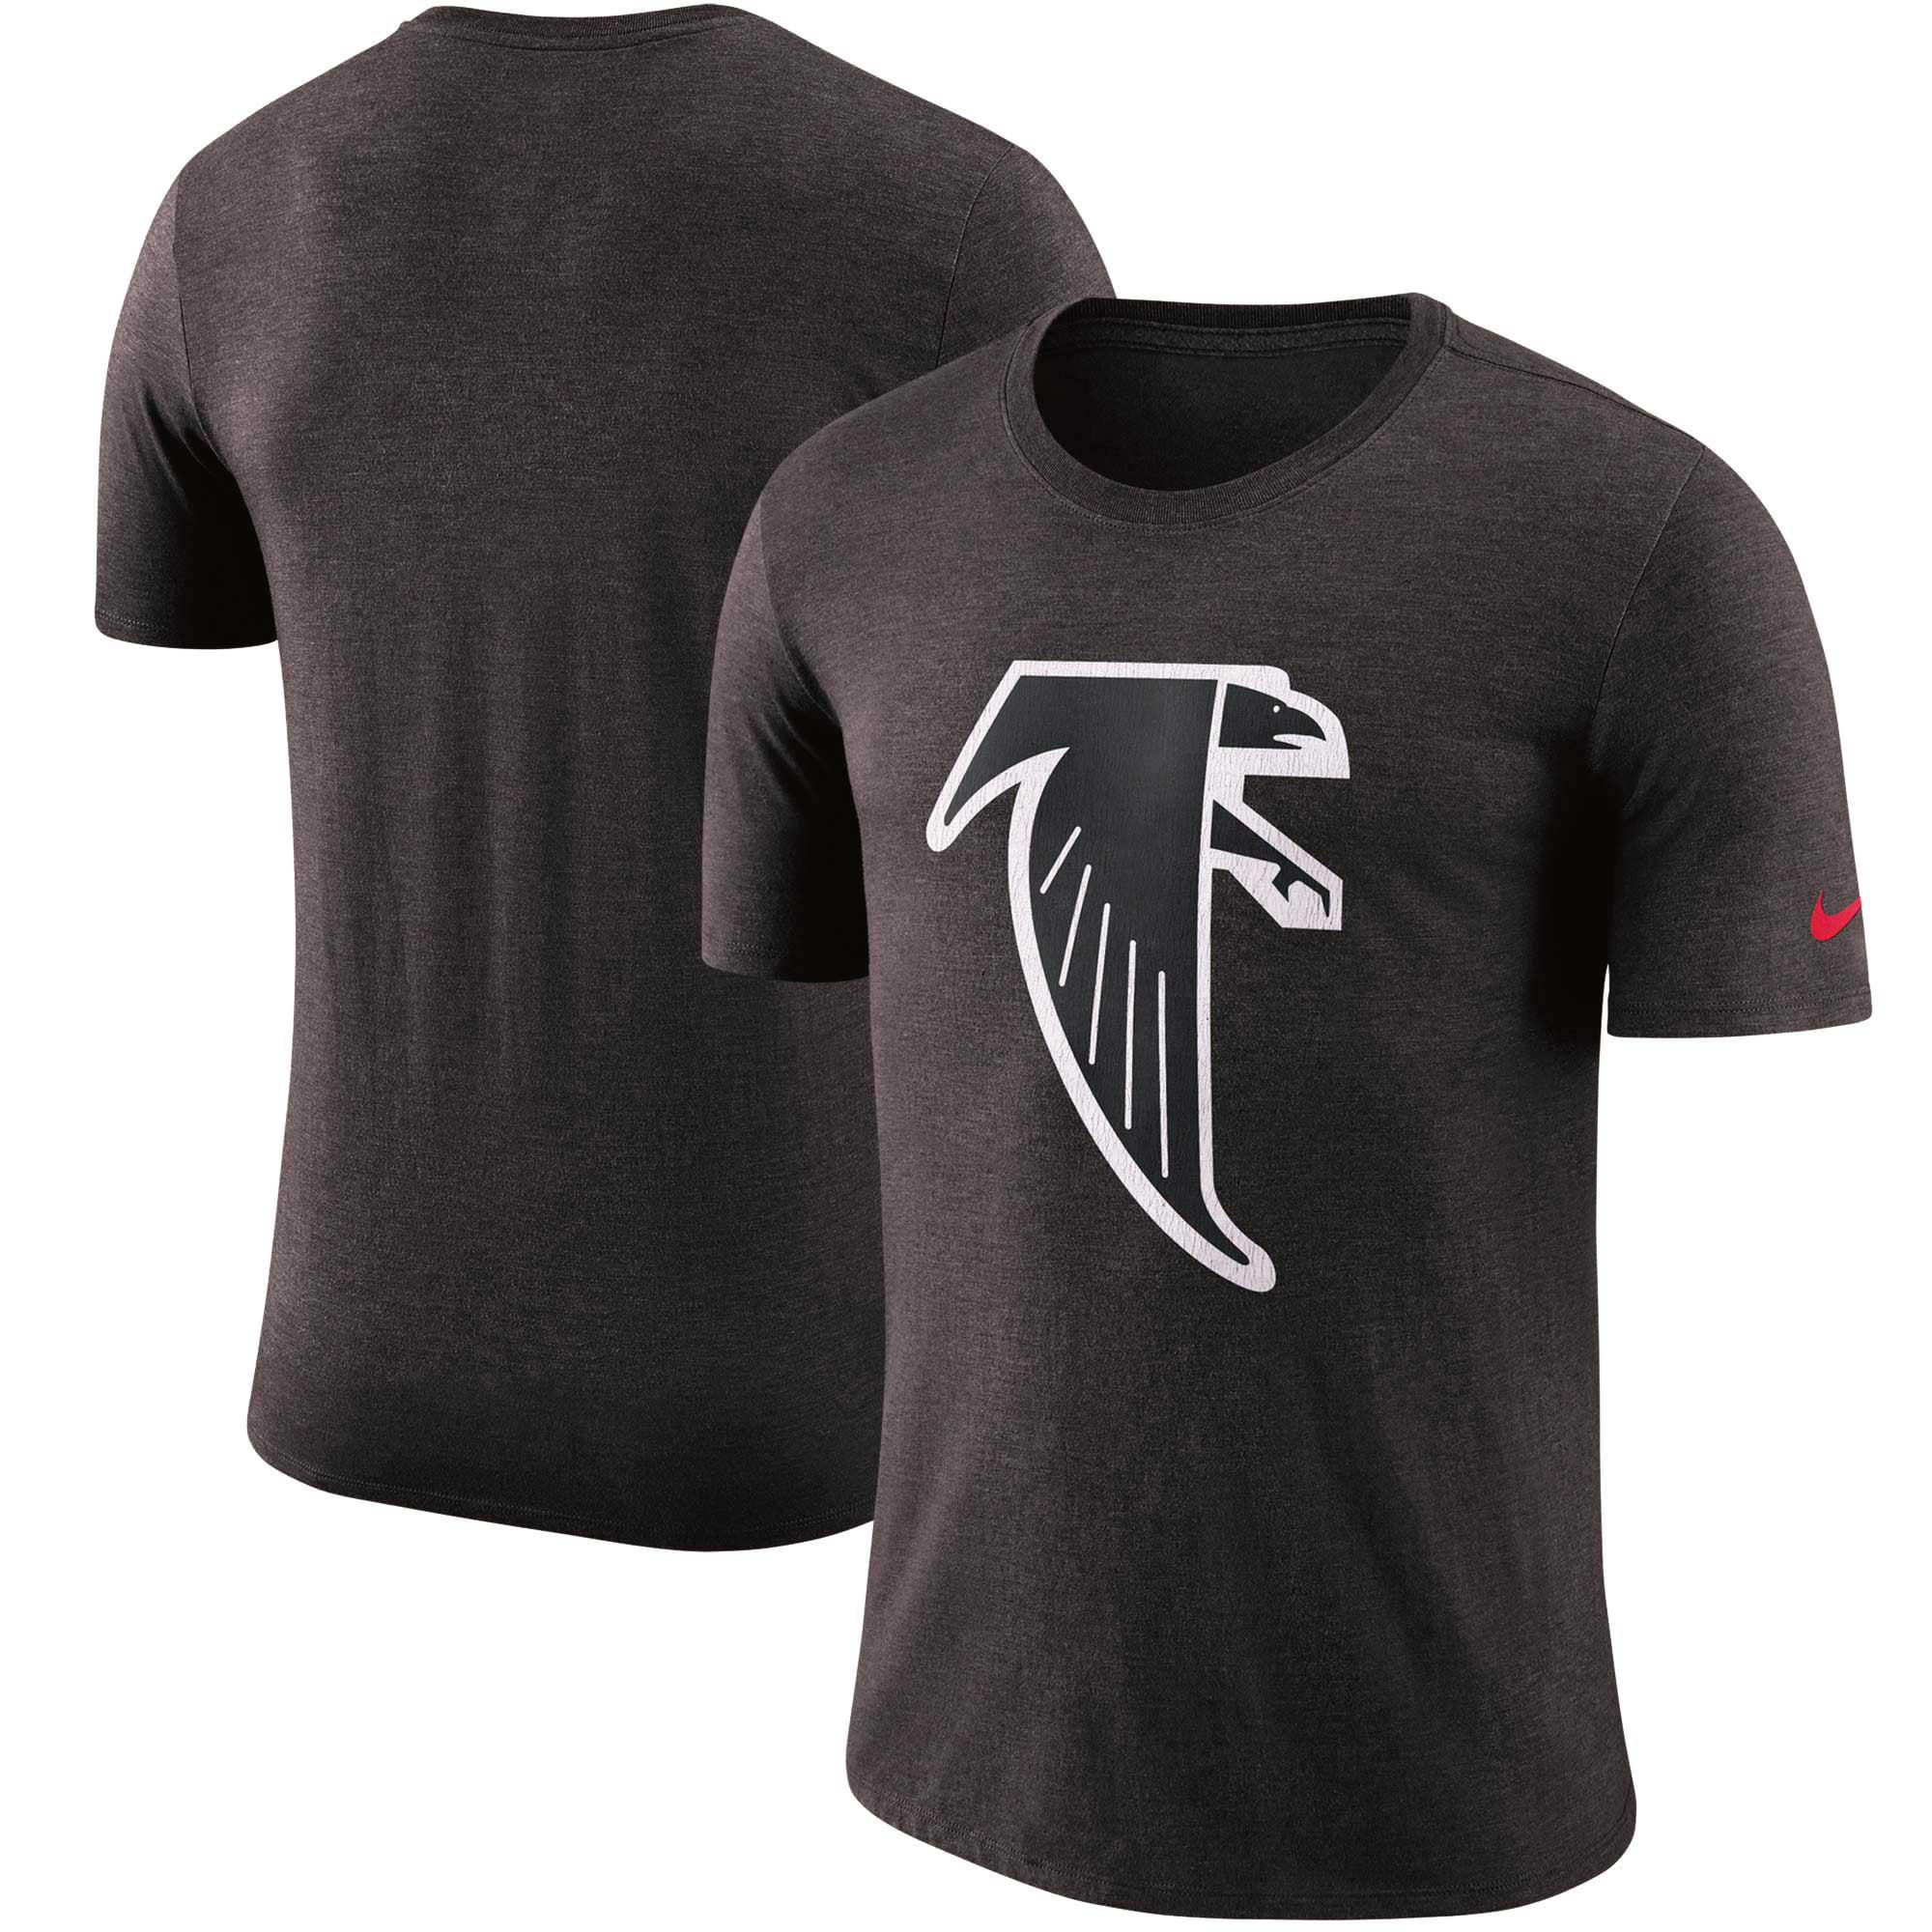 Atlanta Falcons Nike Historic Tri-Blend Crackle T-Shirt - Heathered Black